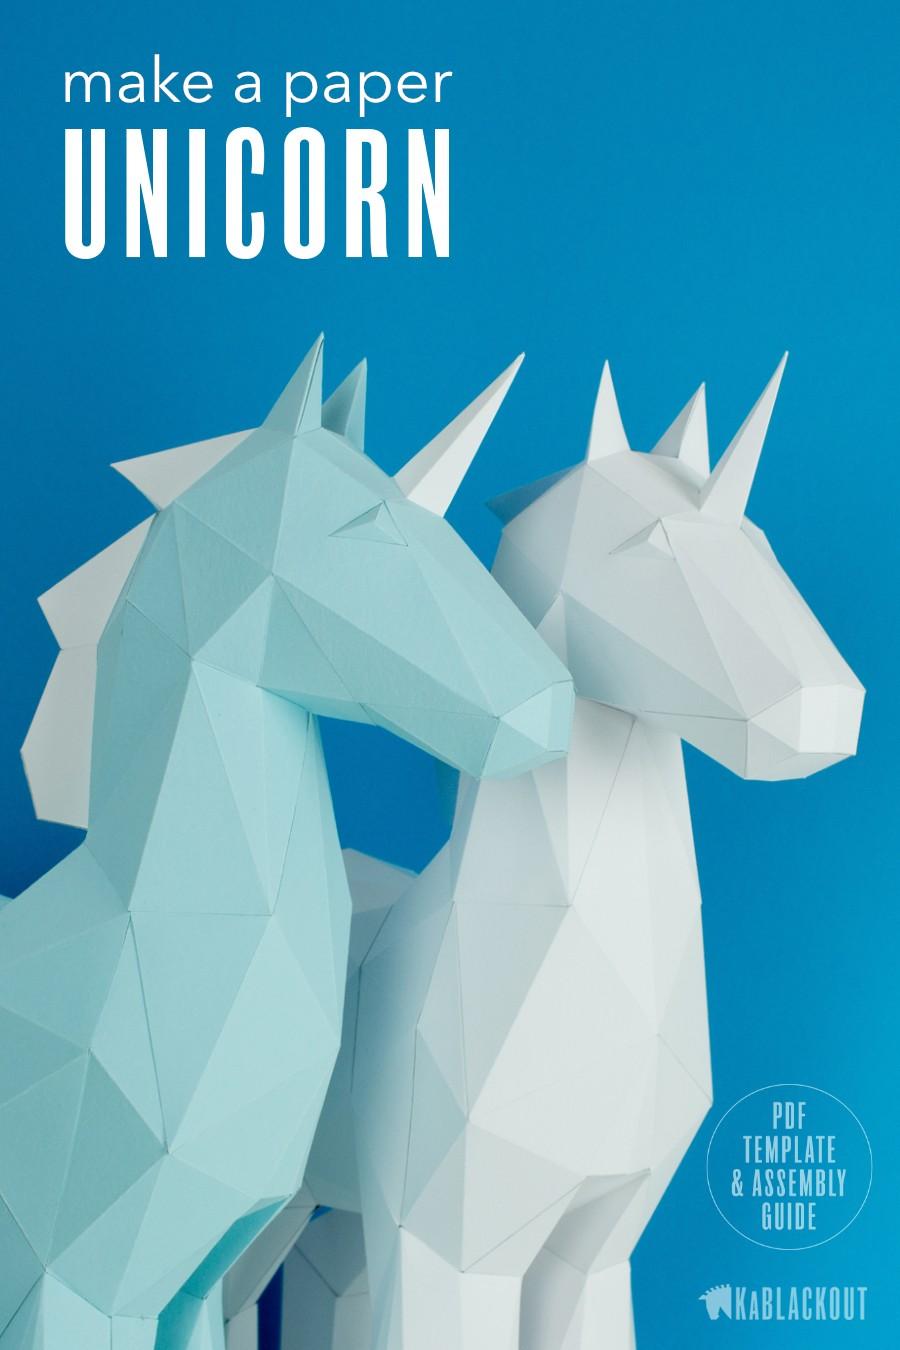 Papercraft Rabbit Papercraft Unicorn Template Diy Unicorn Papercraft Low Poly